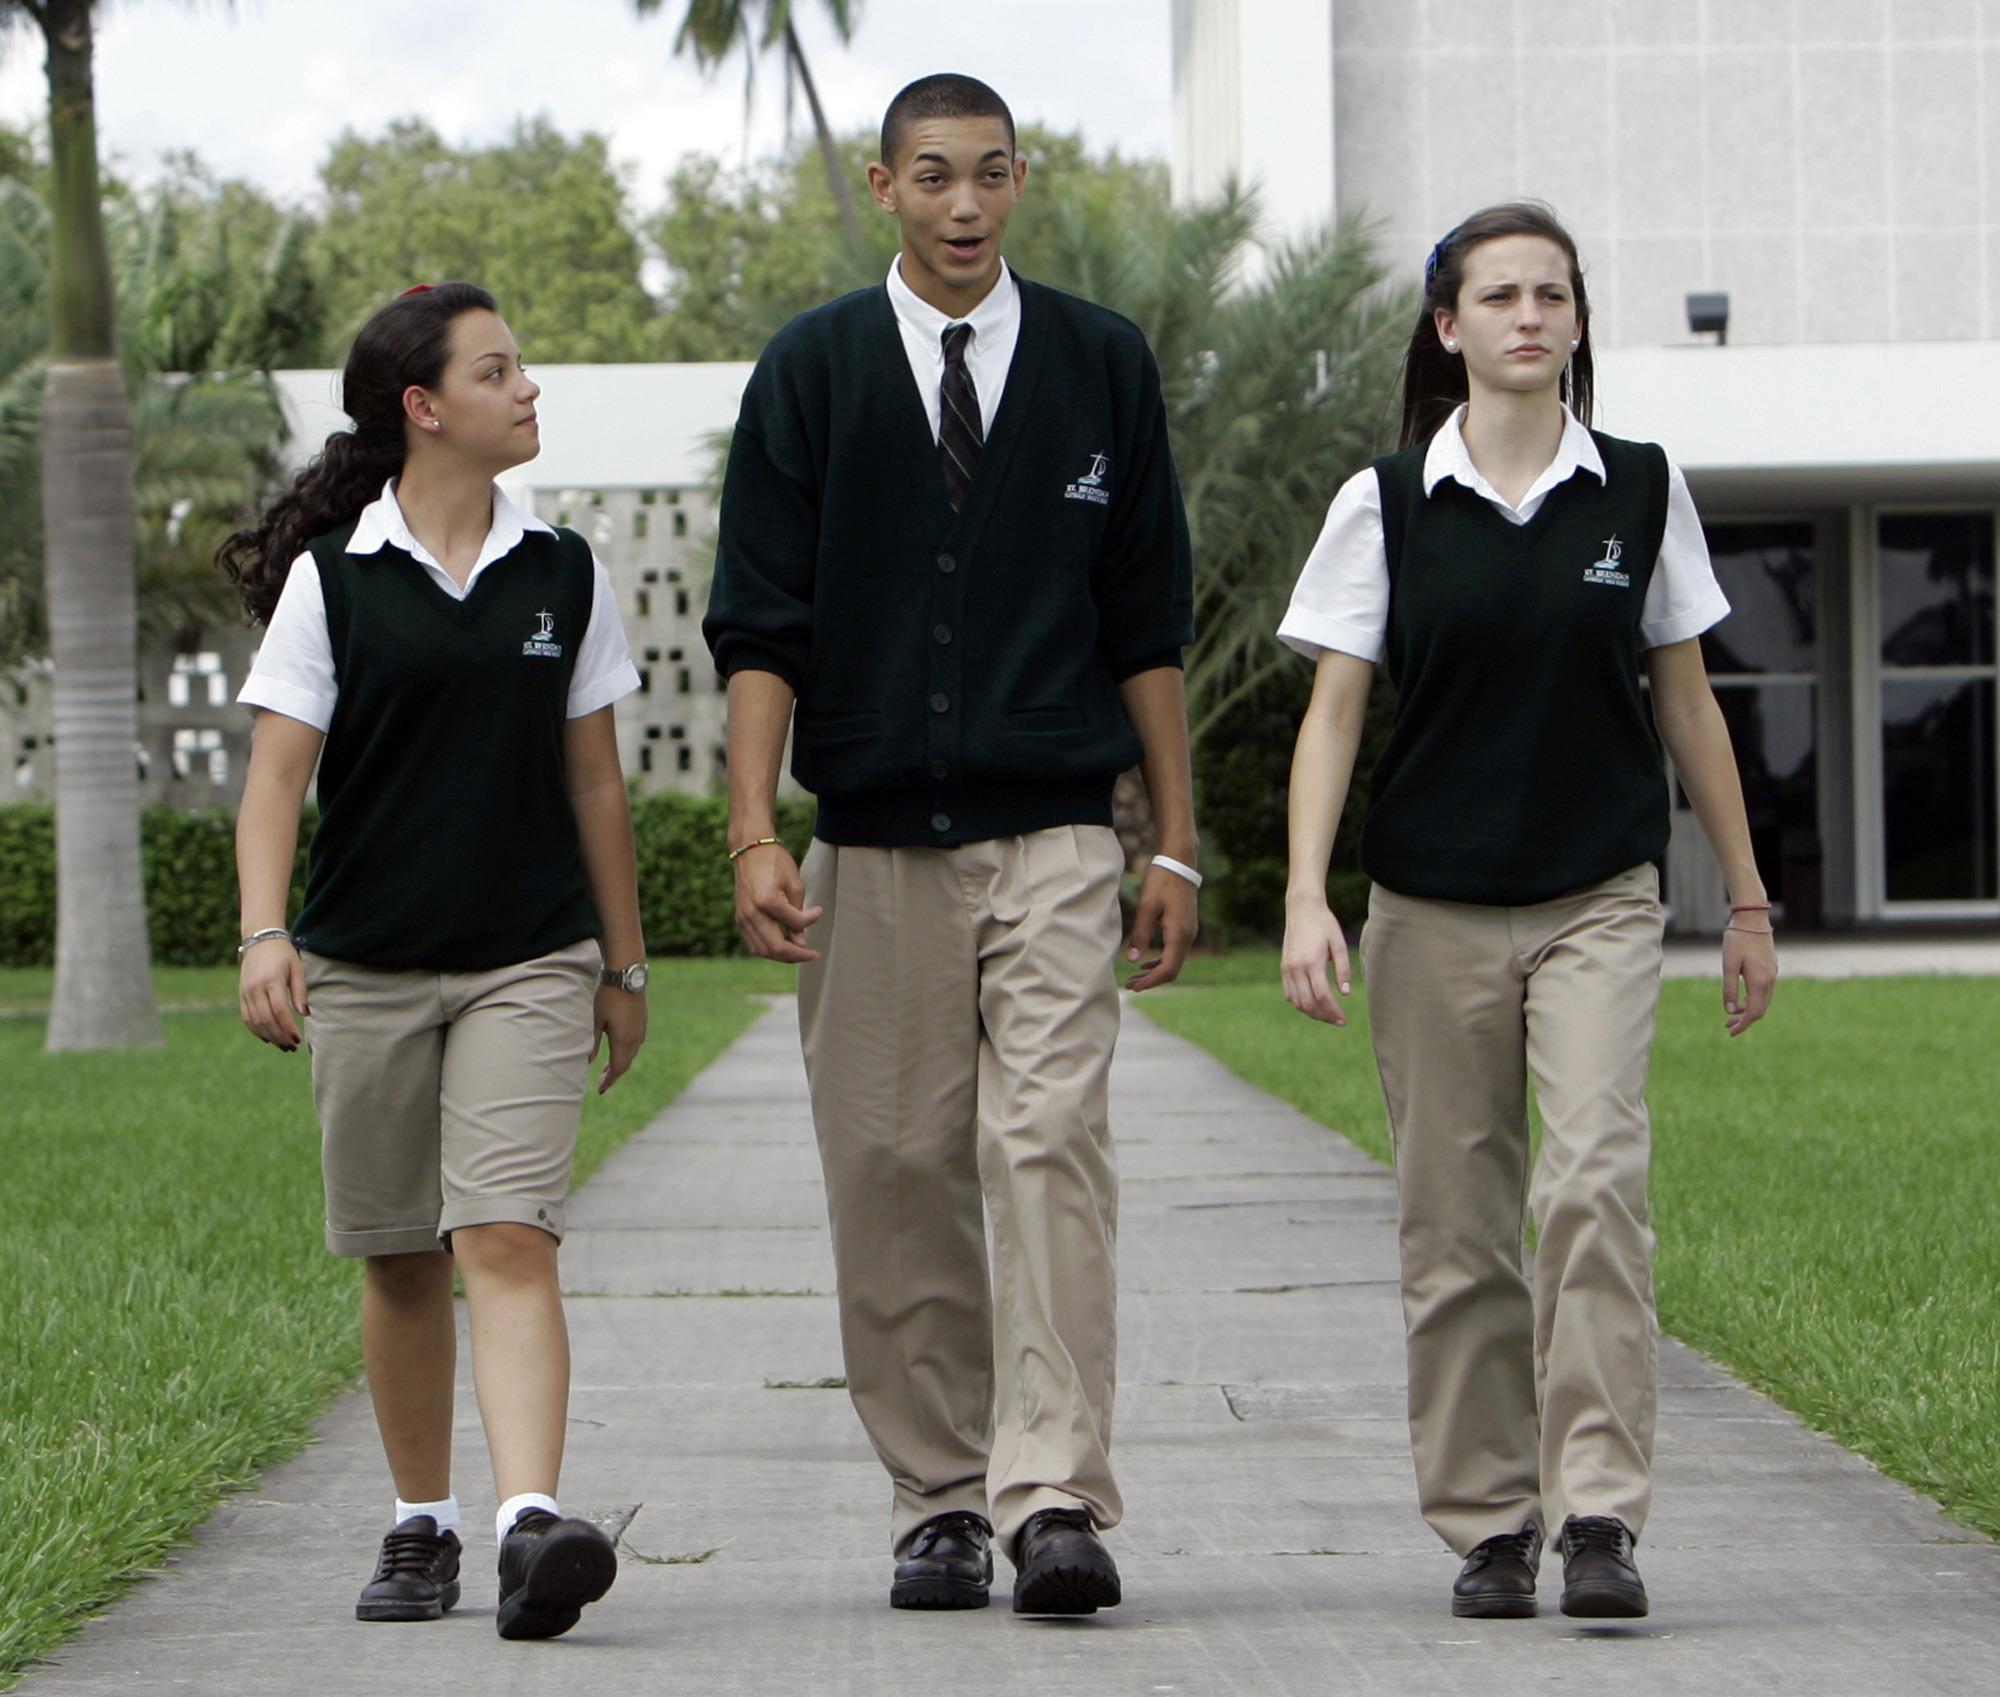 Uk uniforms